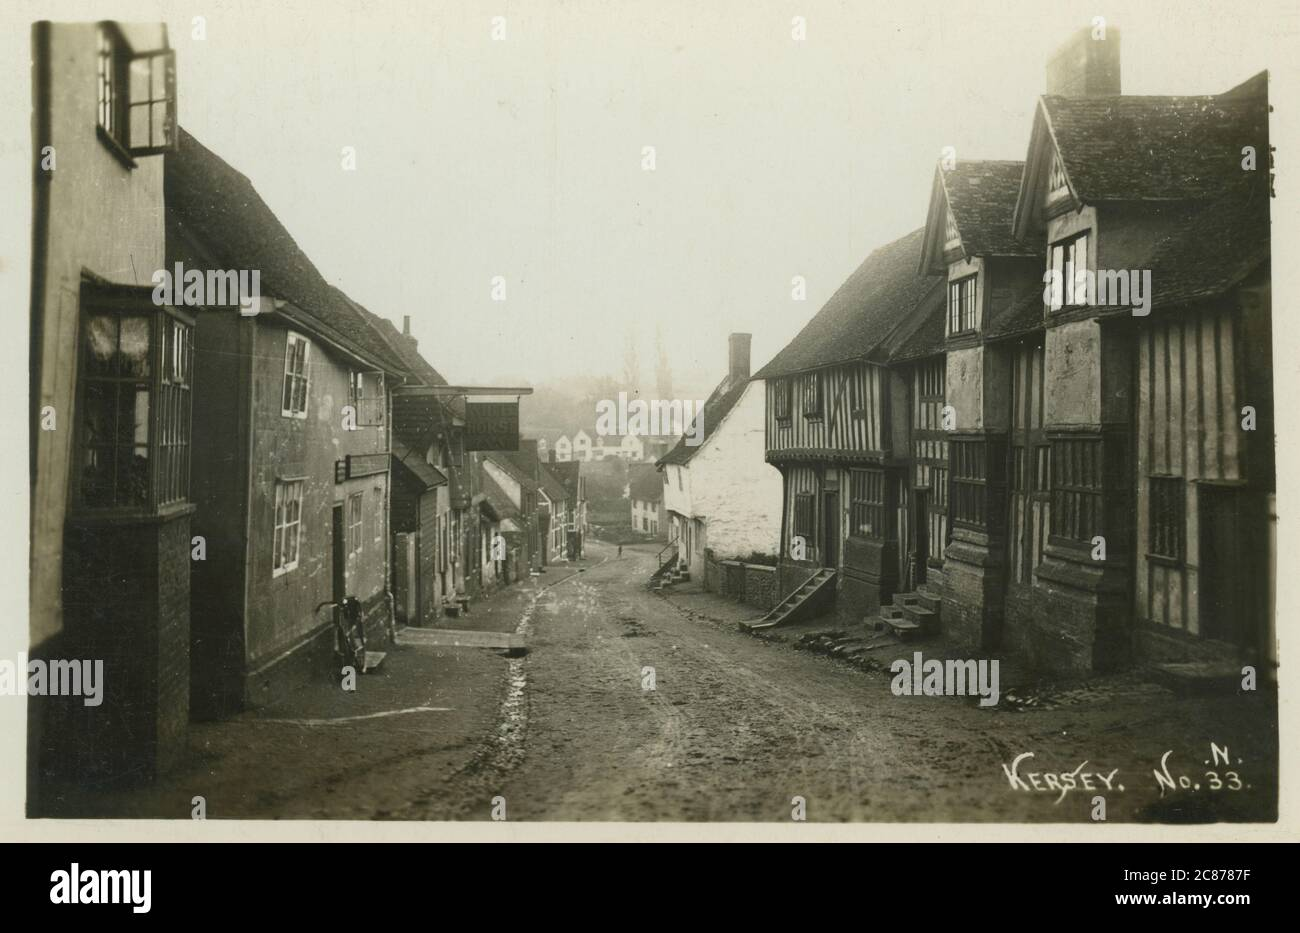 The Street, Kersey, Ipswich, Babergh, Suffolk, England.     Date: 1900s Stock Photo